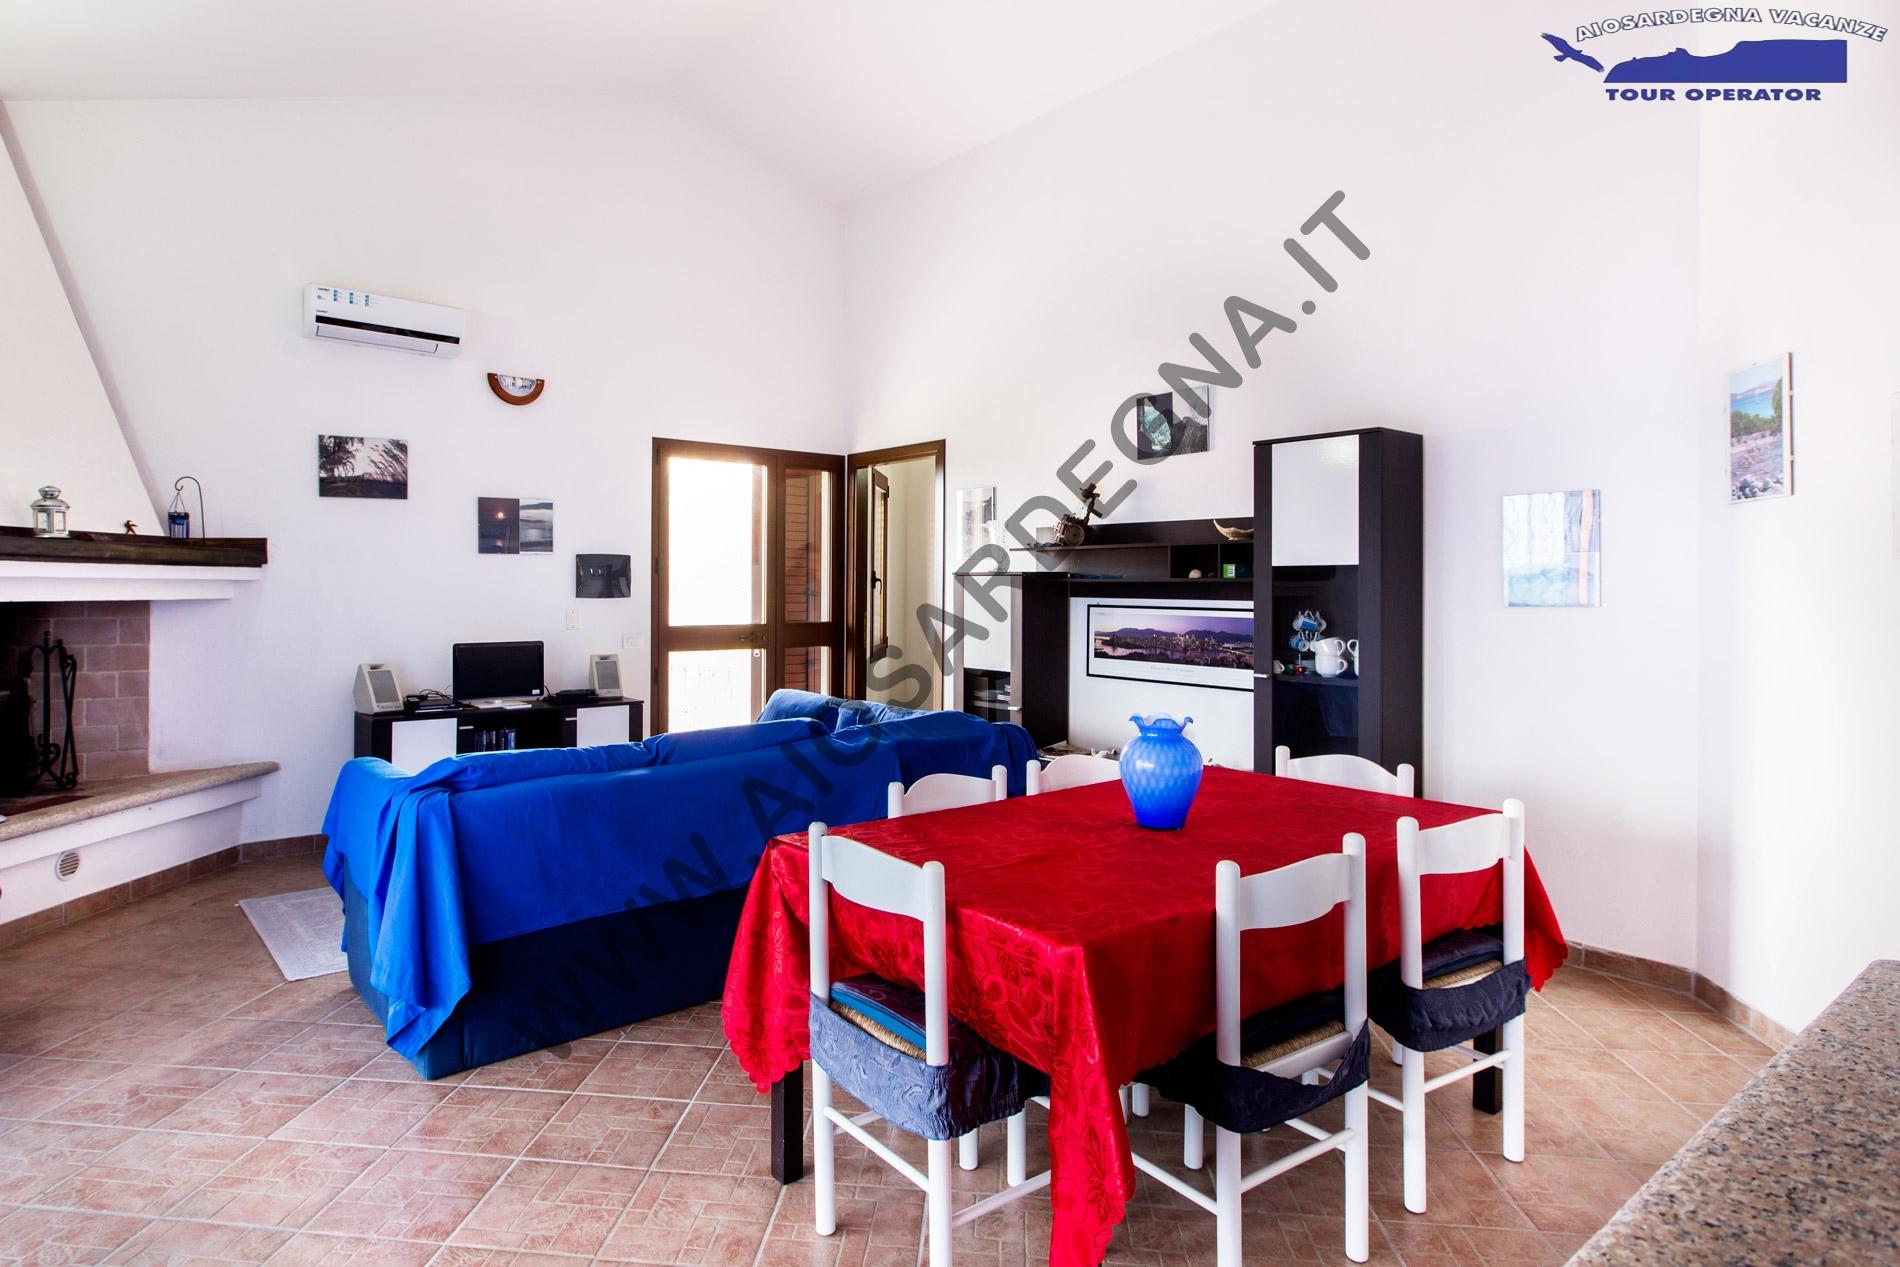 Villa Rosa Panoramic, South of Sardinia